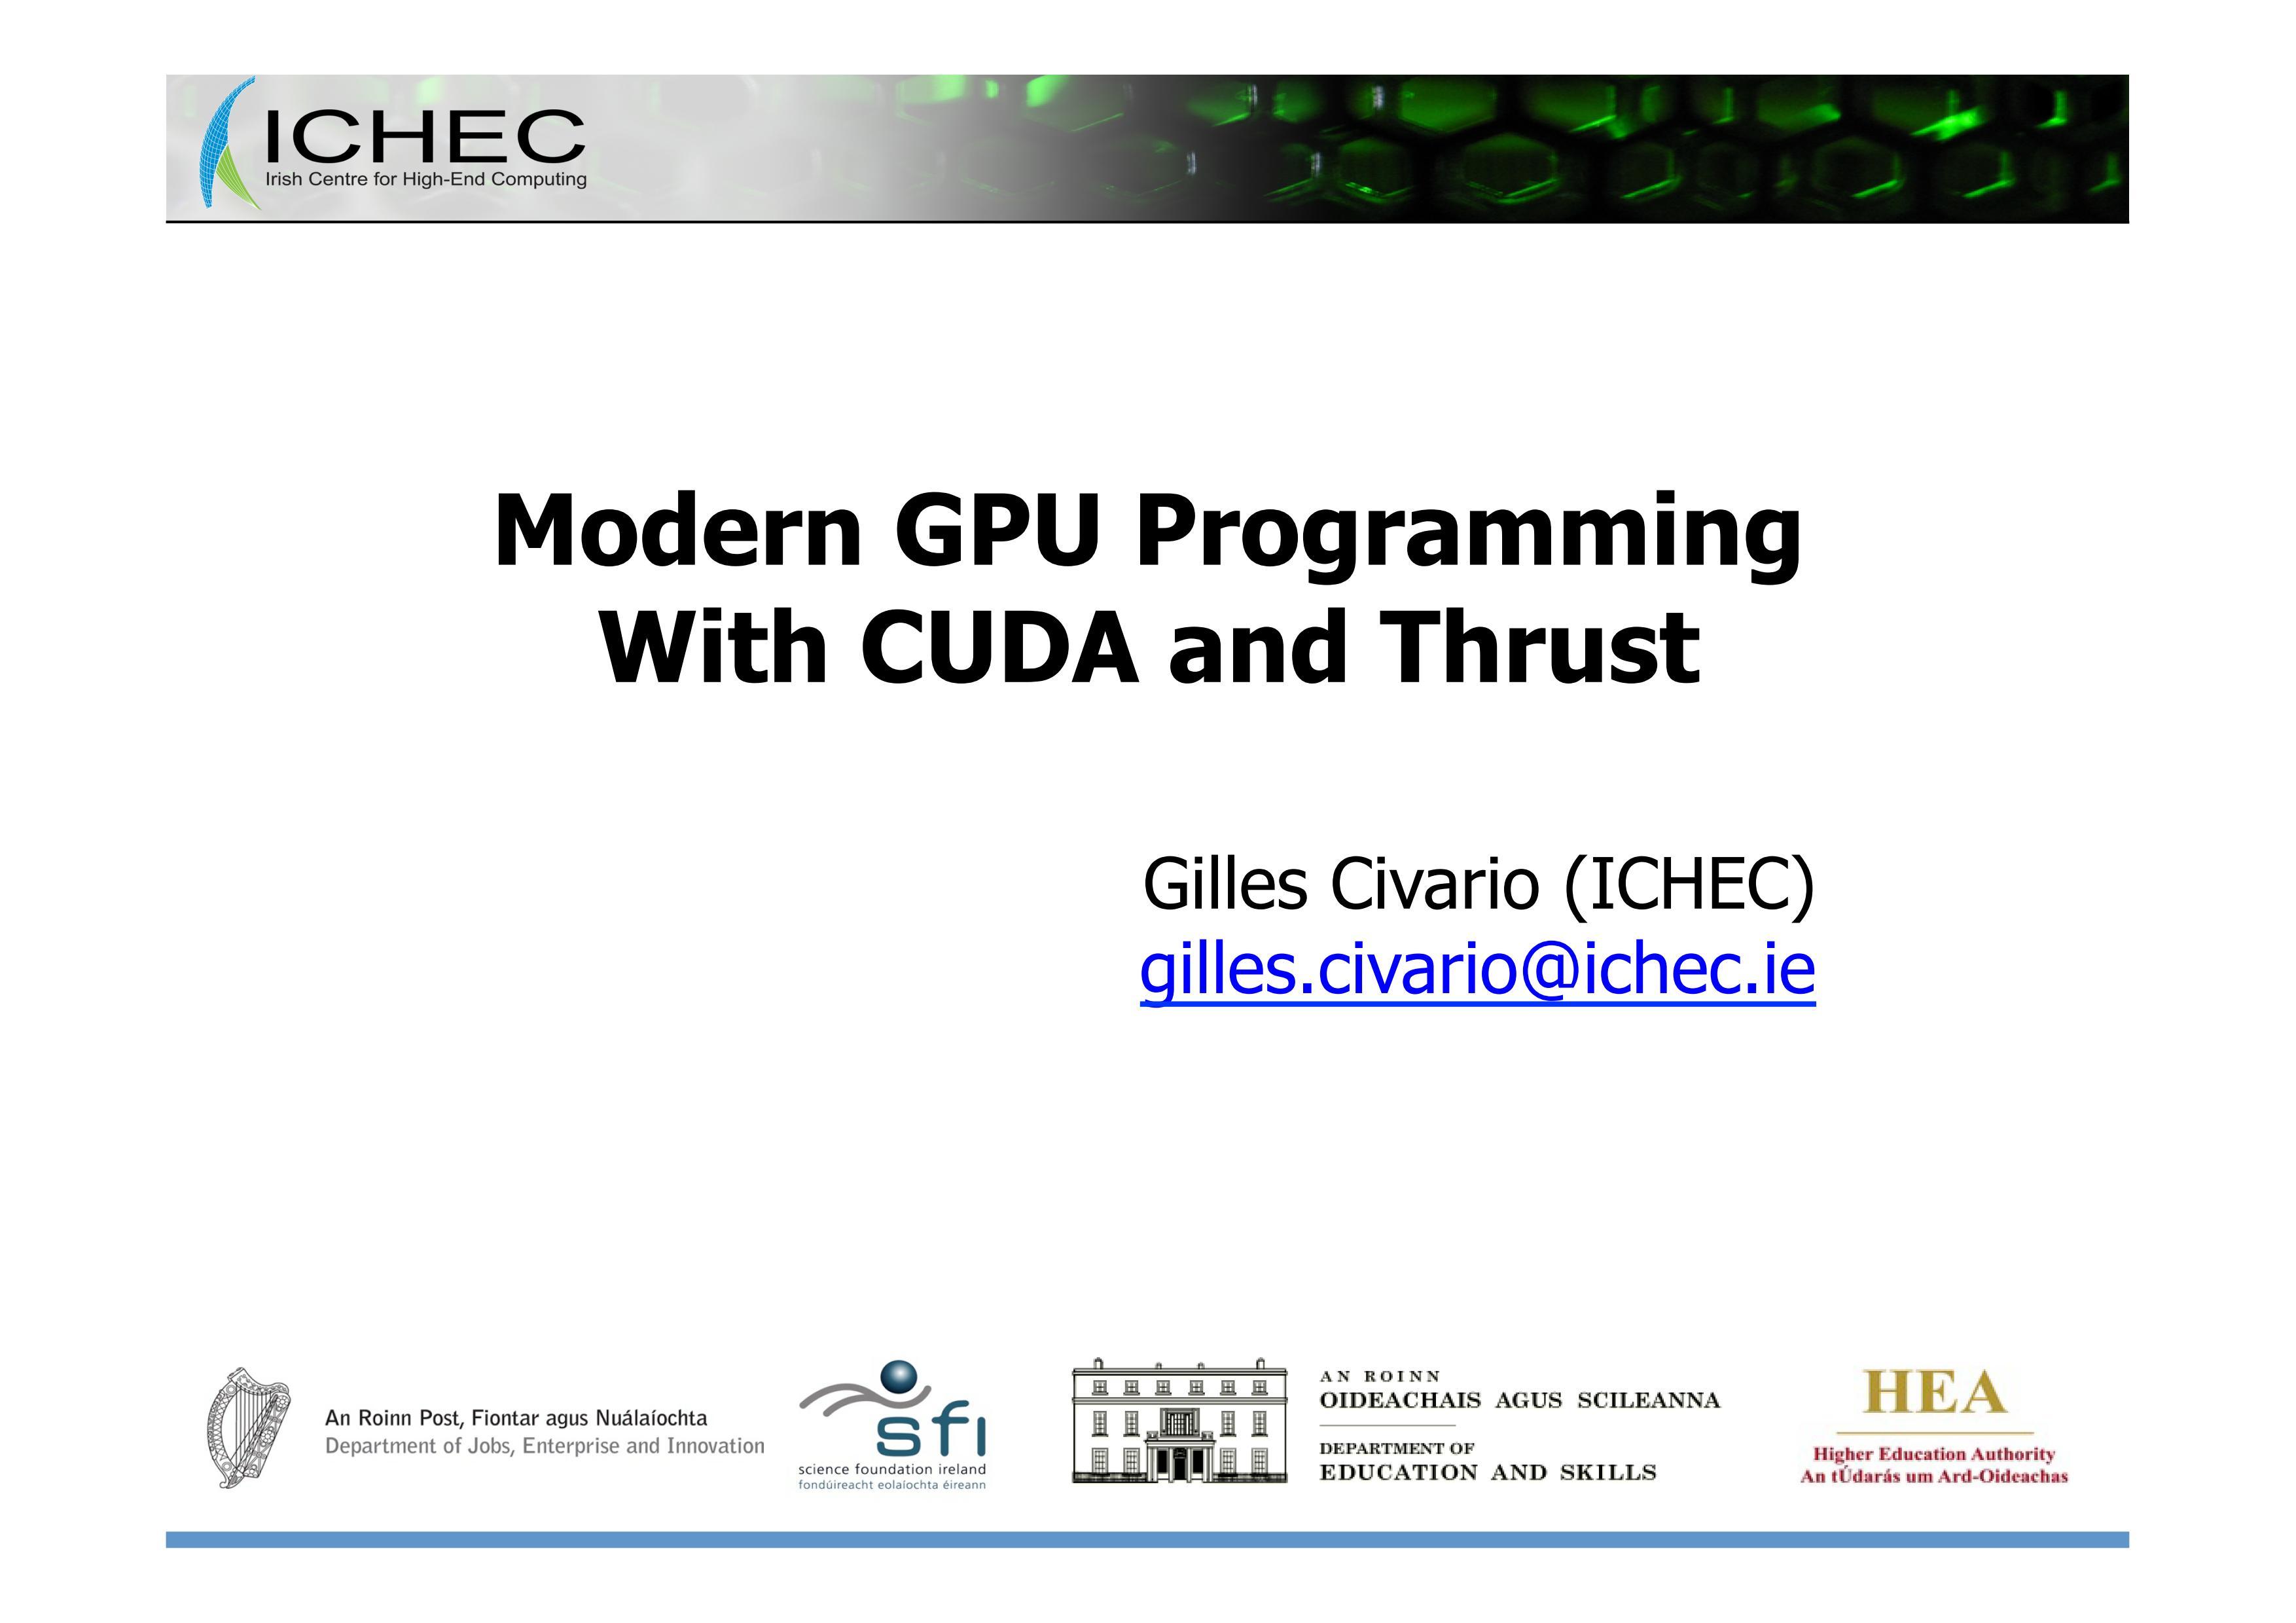 nanoHUB org - Resources: Modern GPU Programming with CUDA